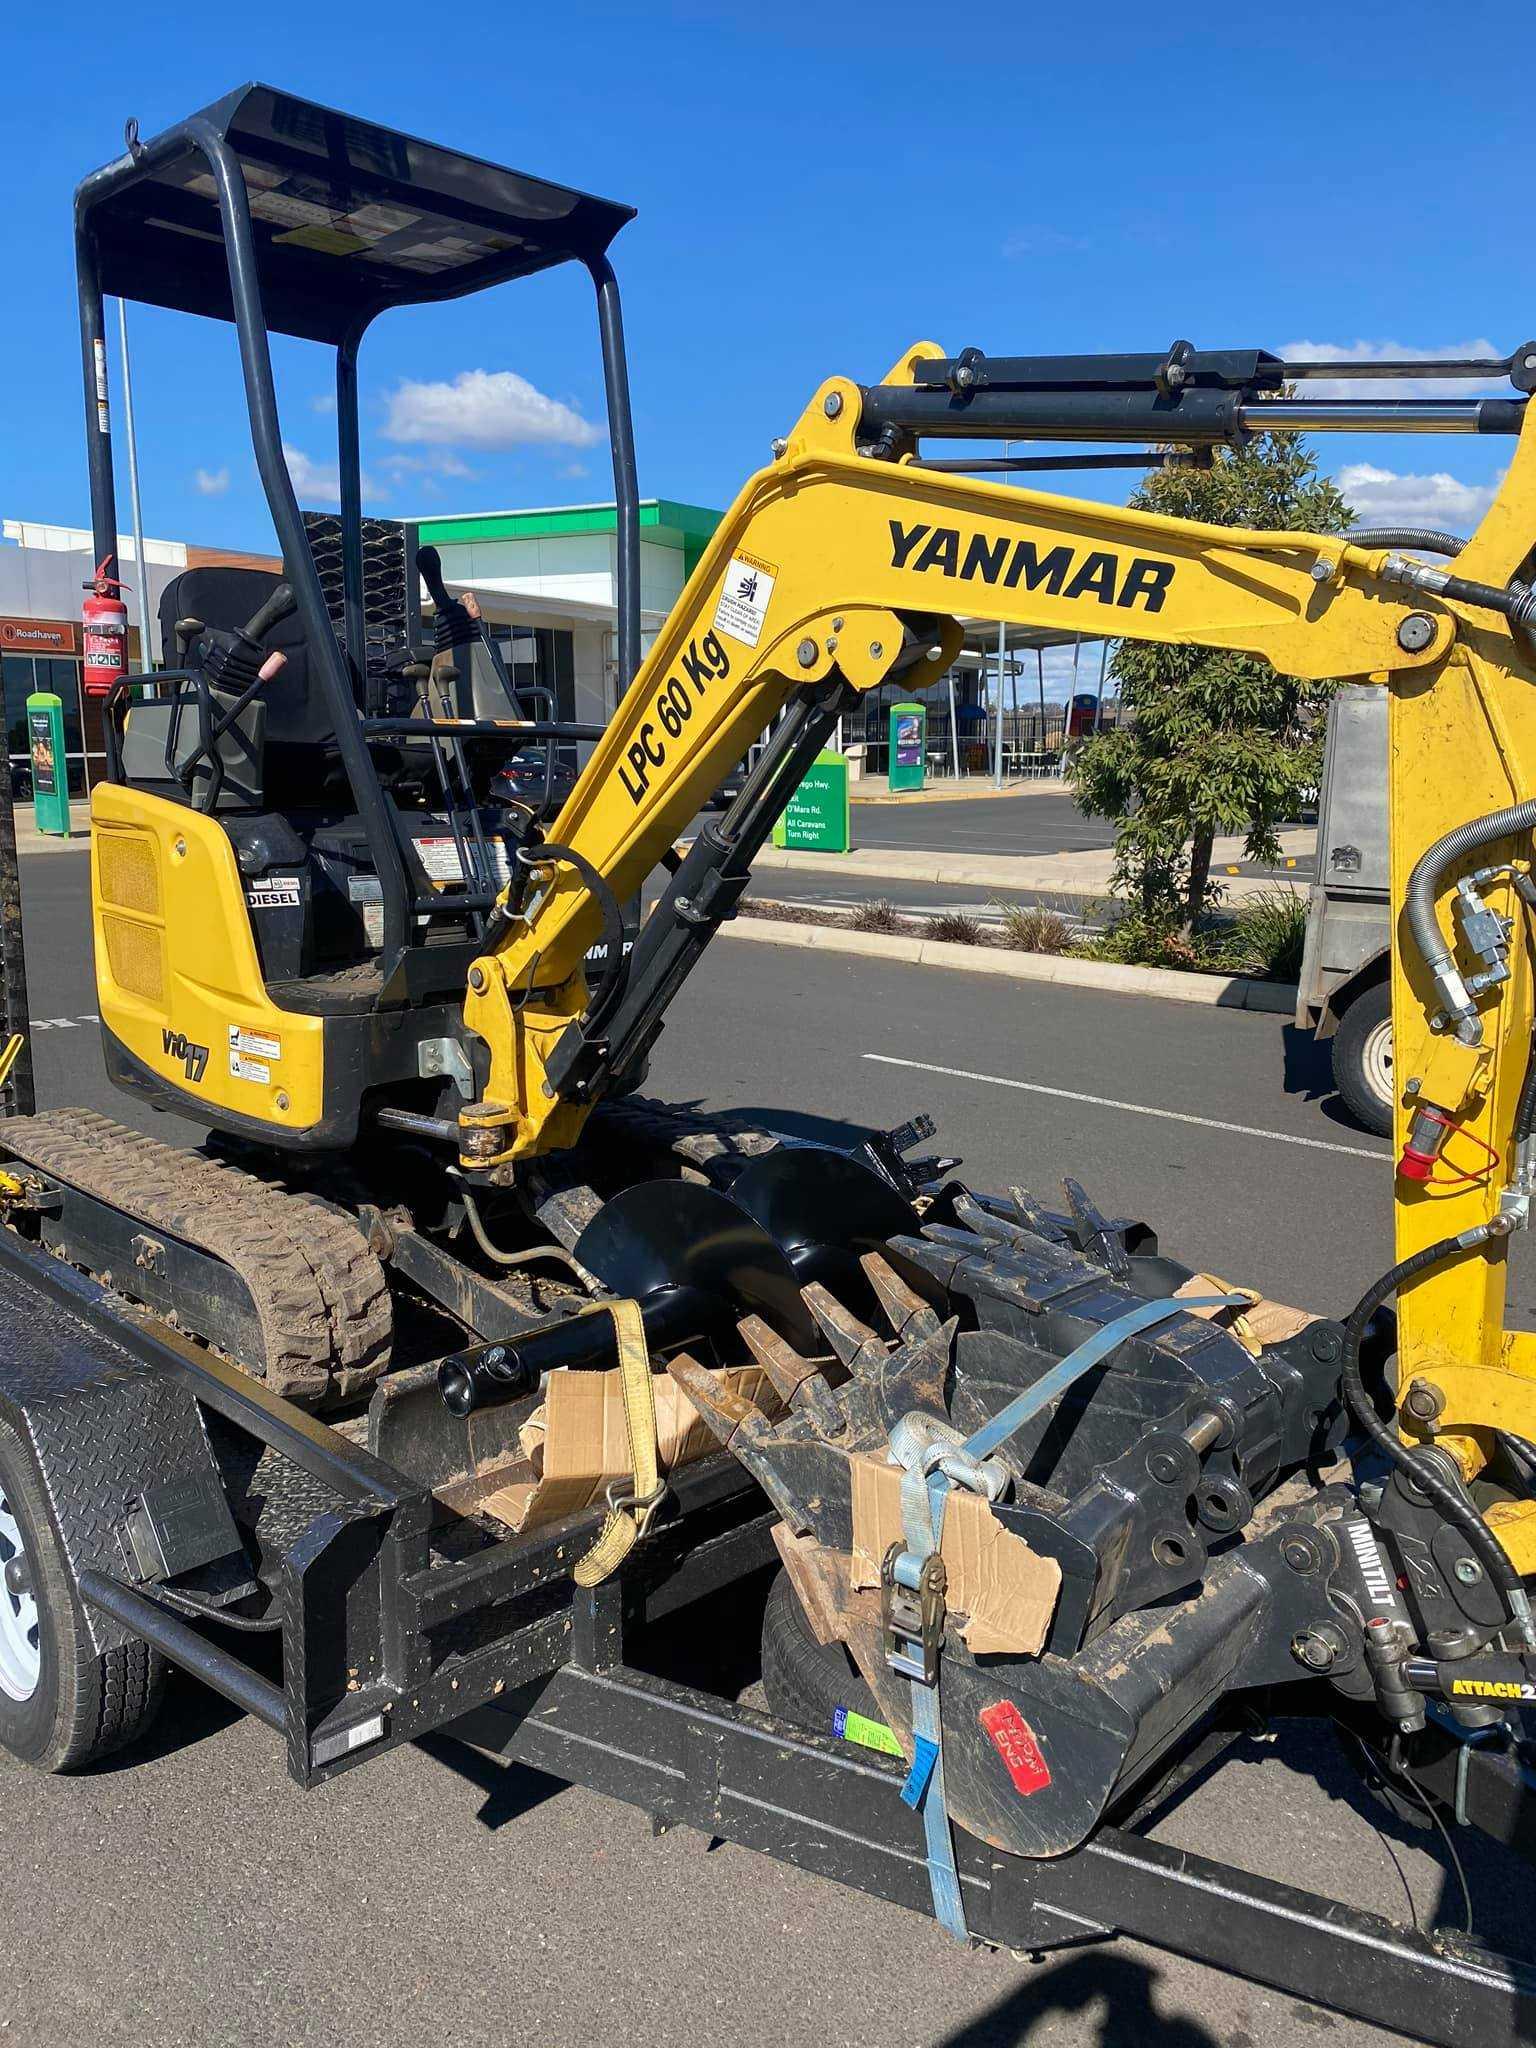 1.7 ton Yanmar excavator for hire near Logan Village